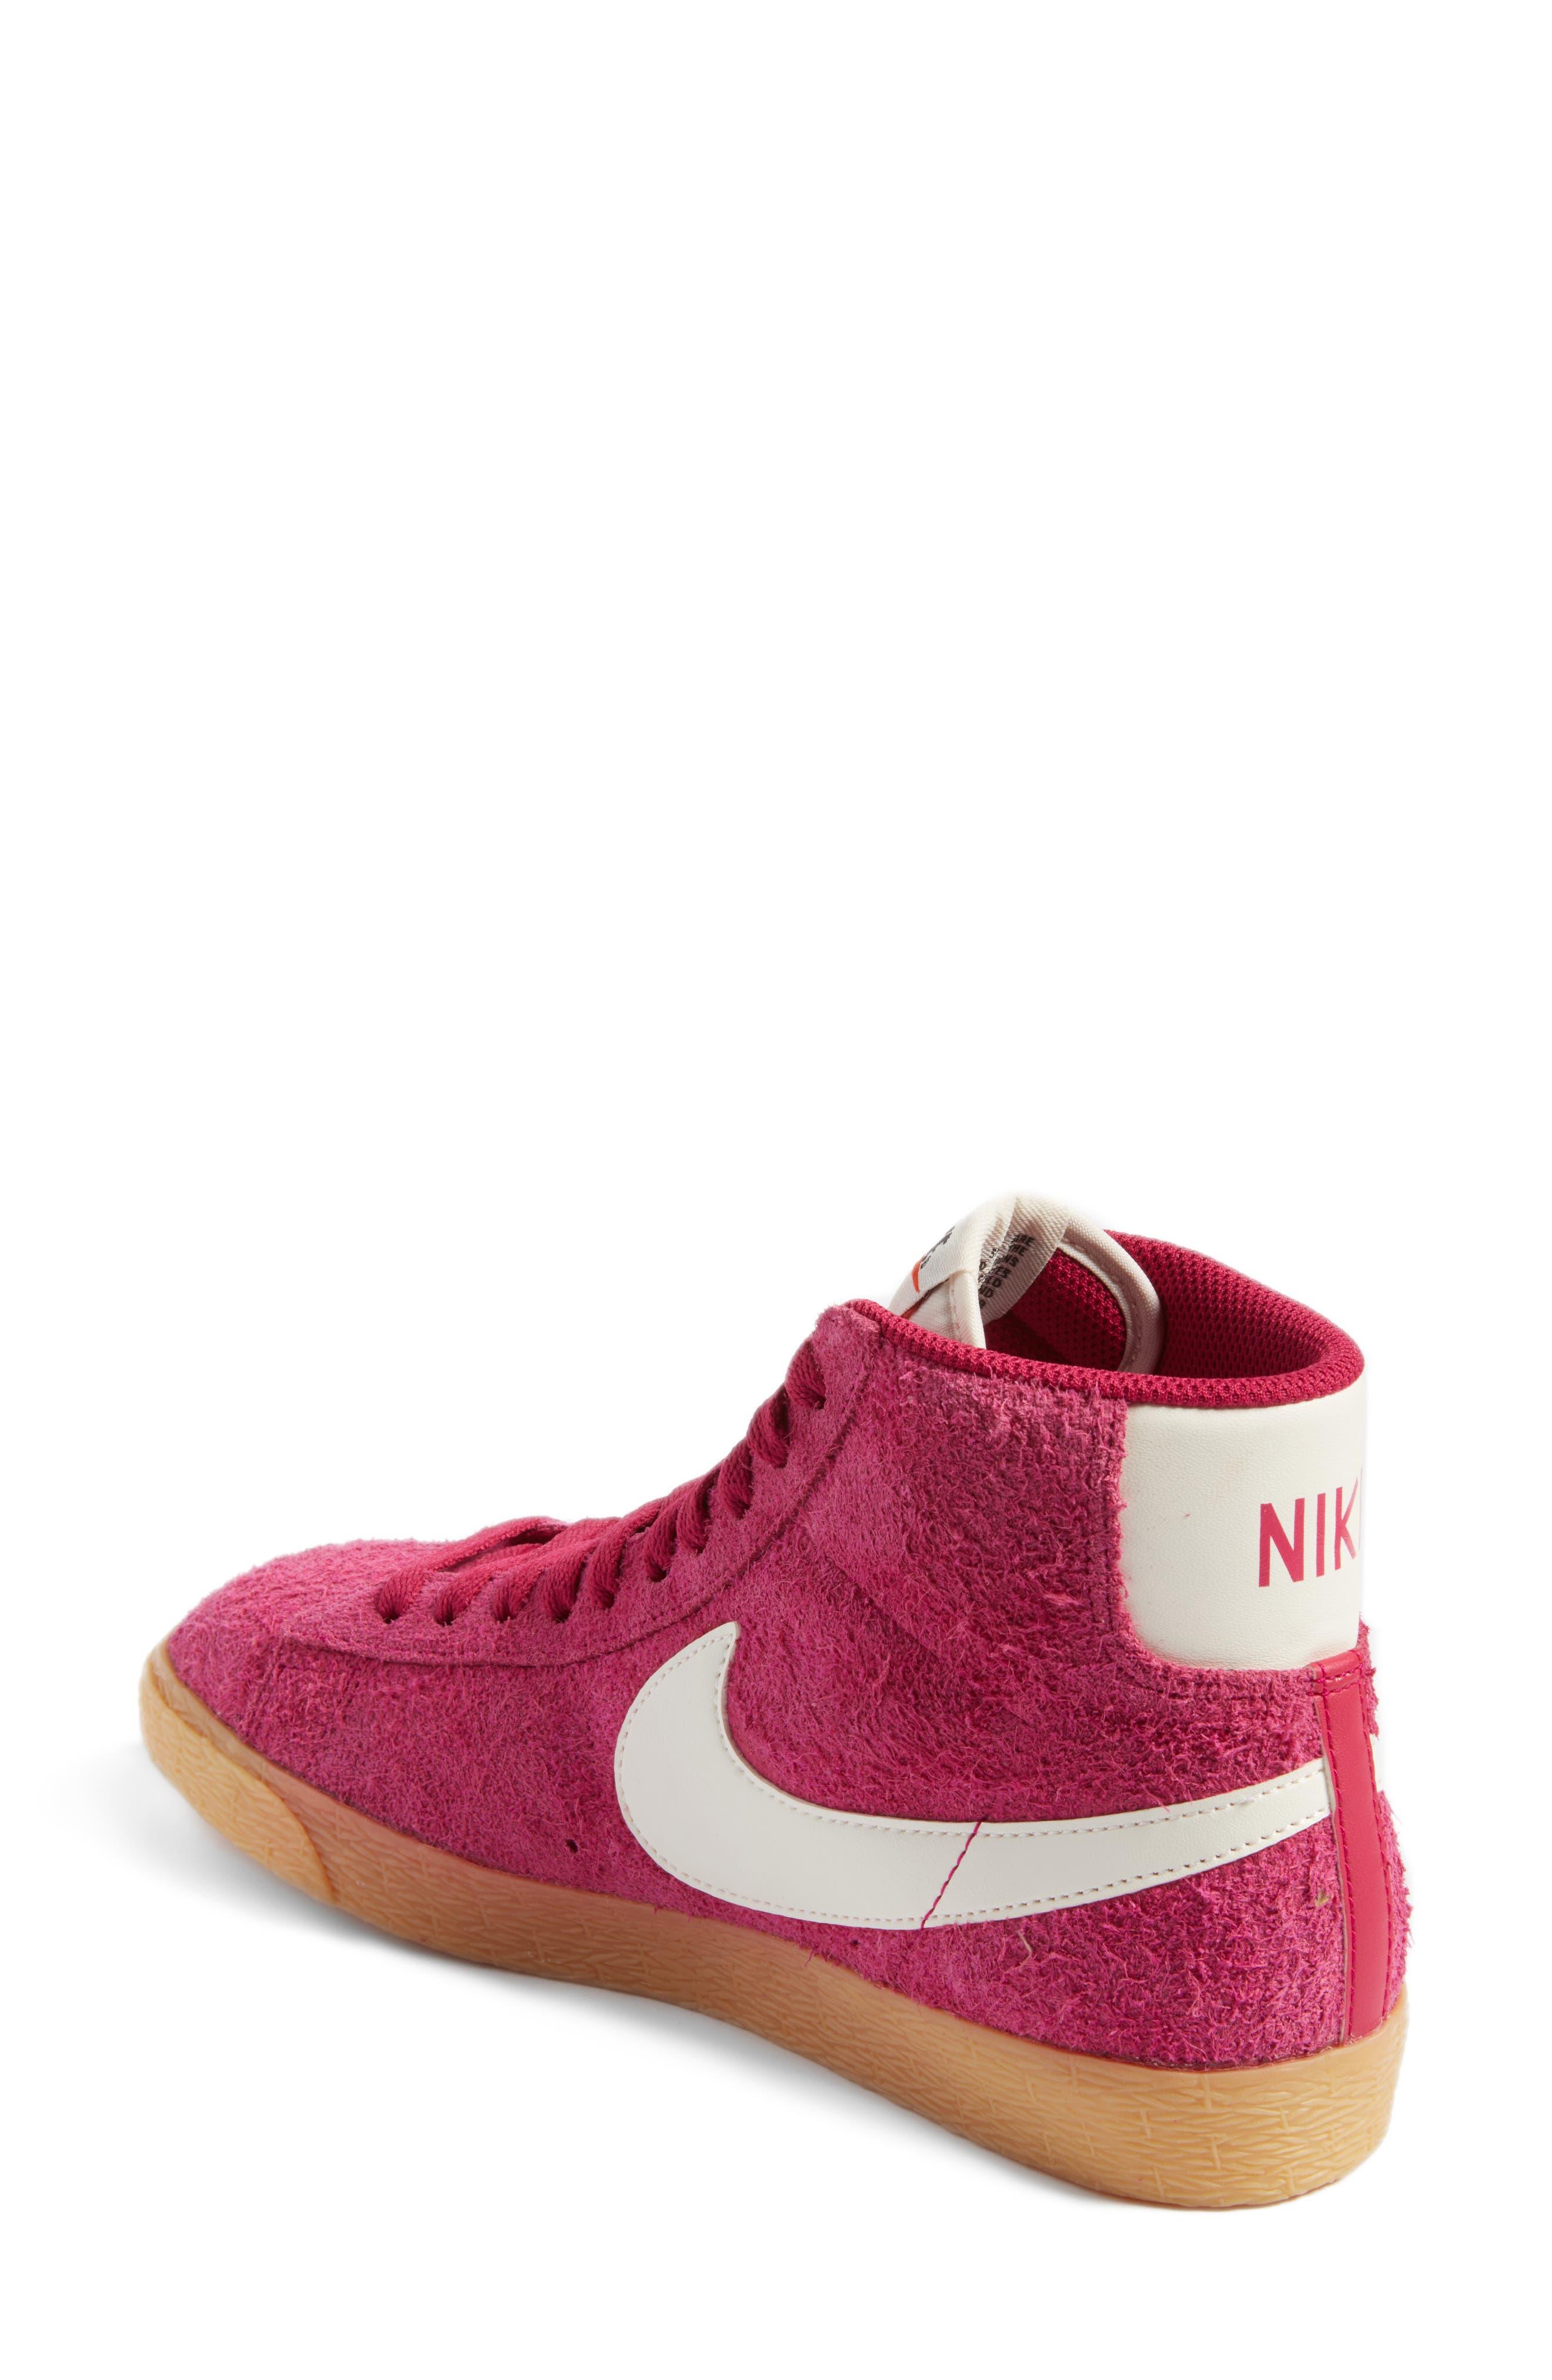 Alternate Image 2  - Nike 'Blazer' Vintage High Top Basketball Sneaker (Women)